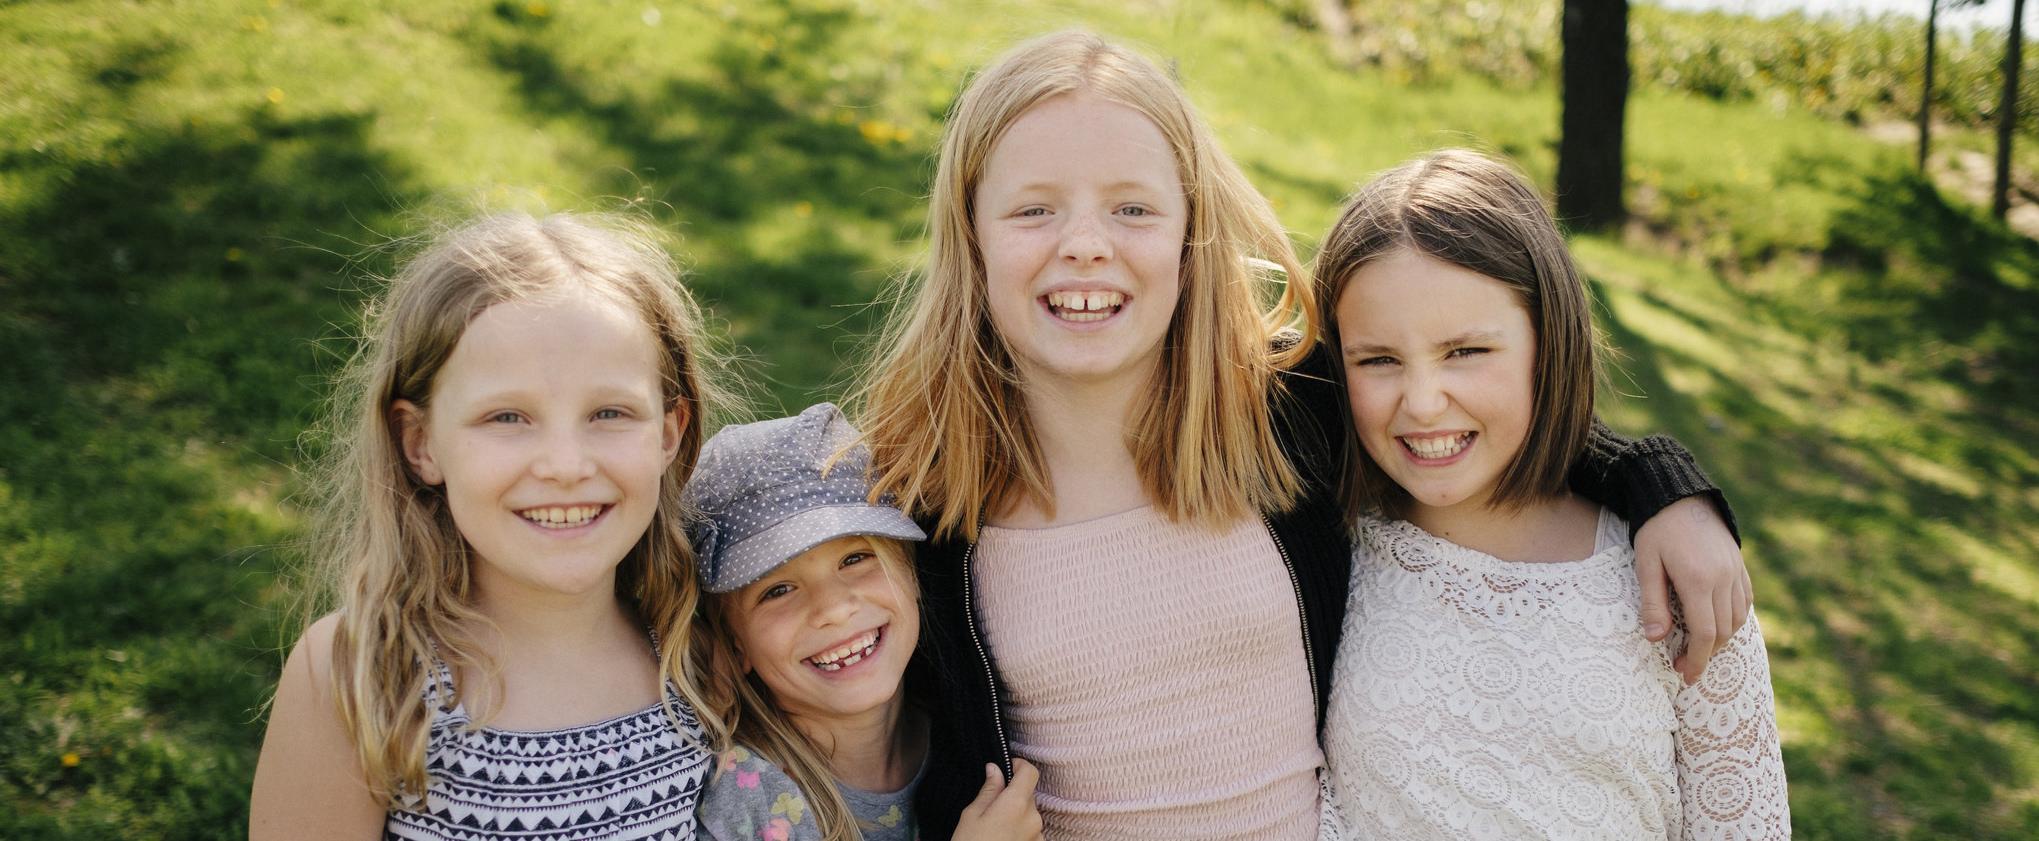 fire jenter i barneskolealder. Foto